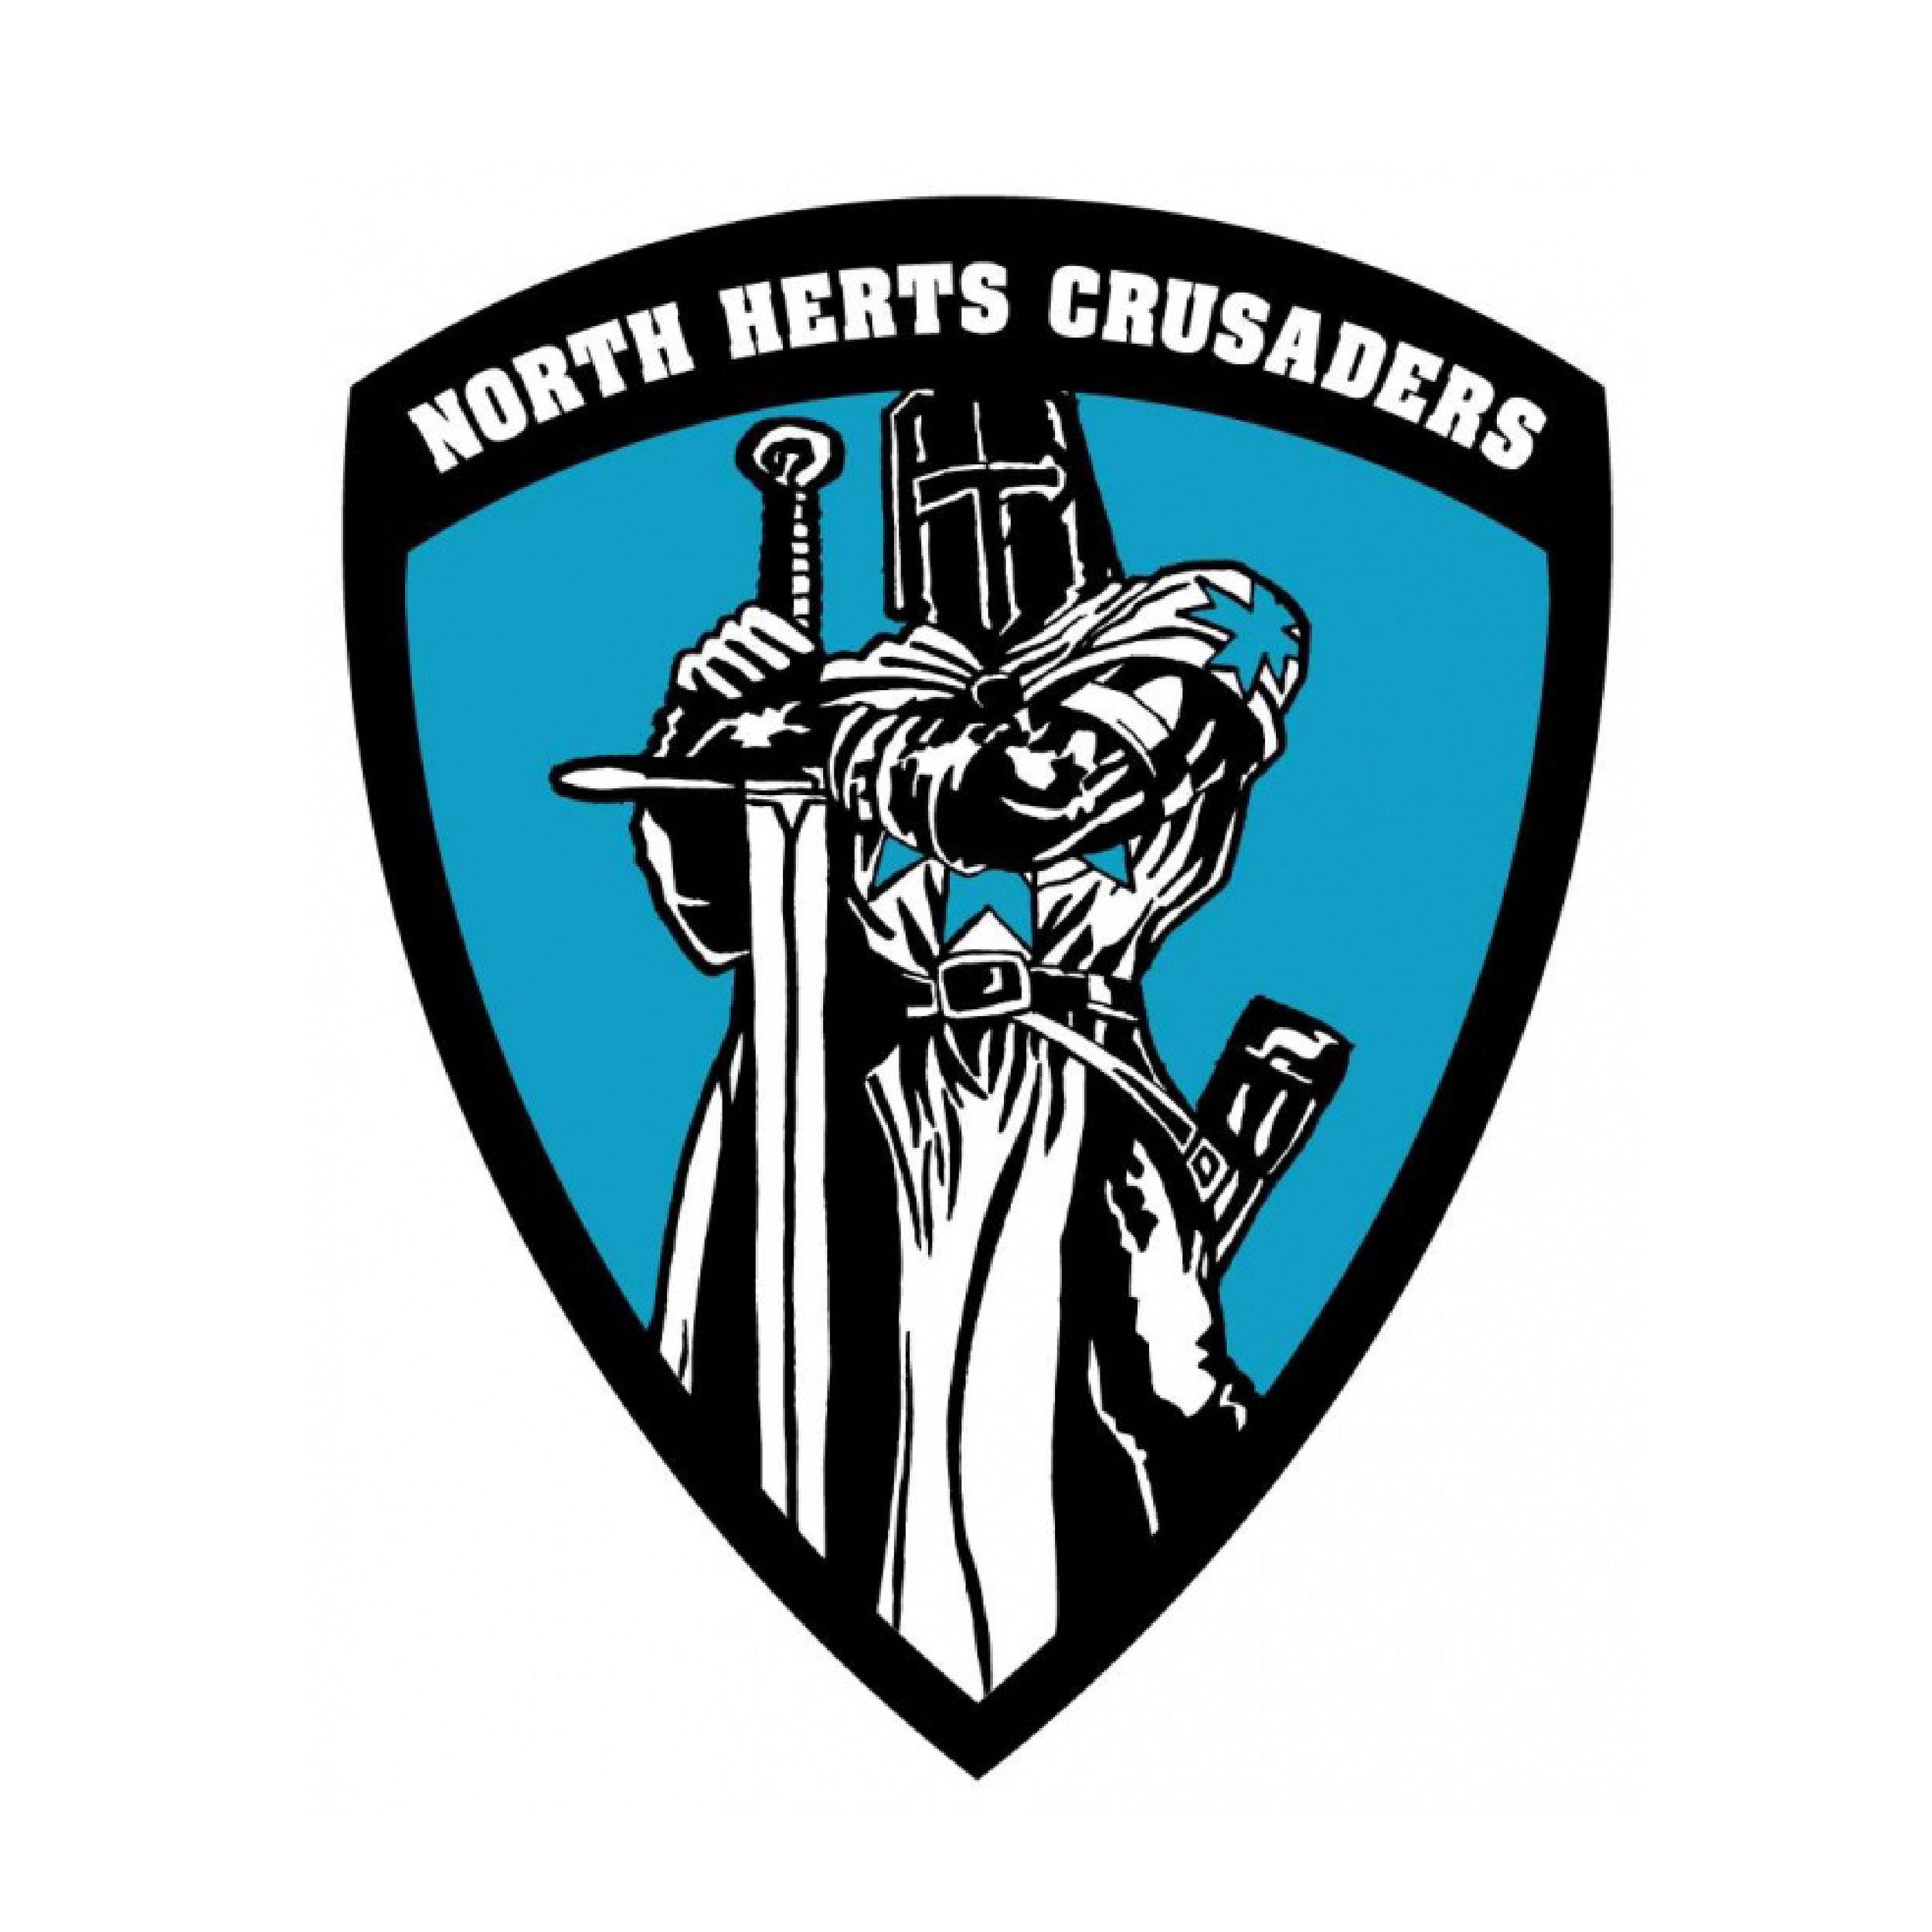 13. NORTH HERTS CRUSADERS